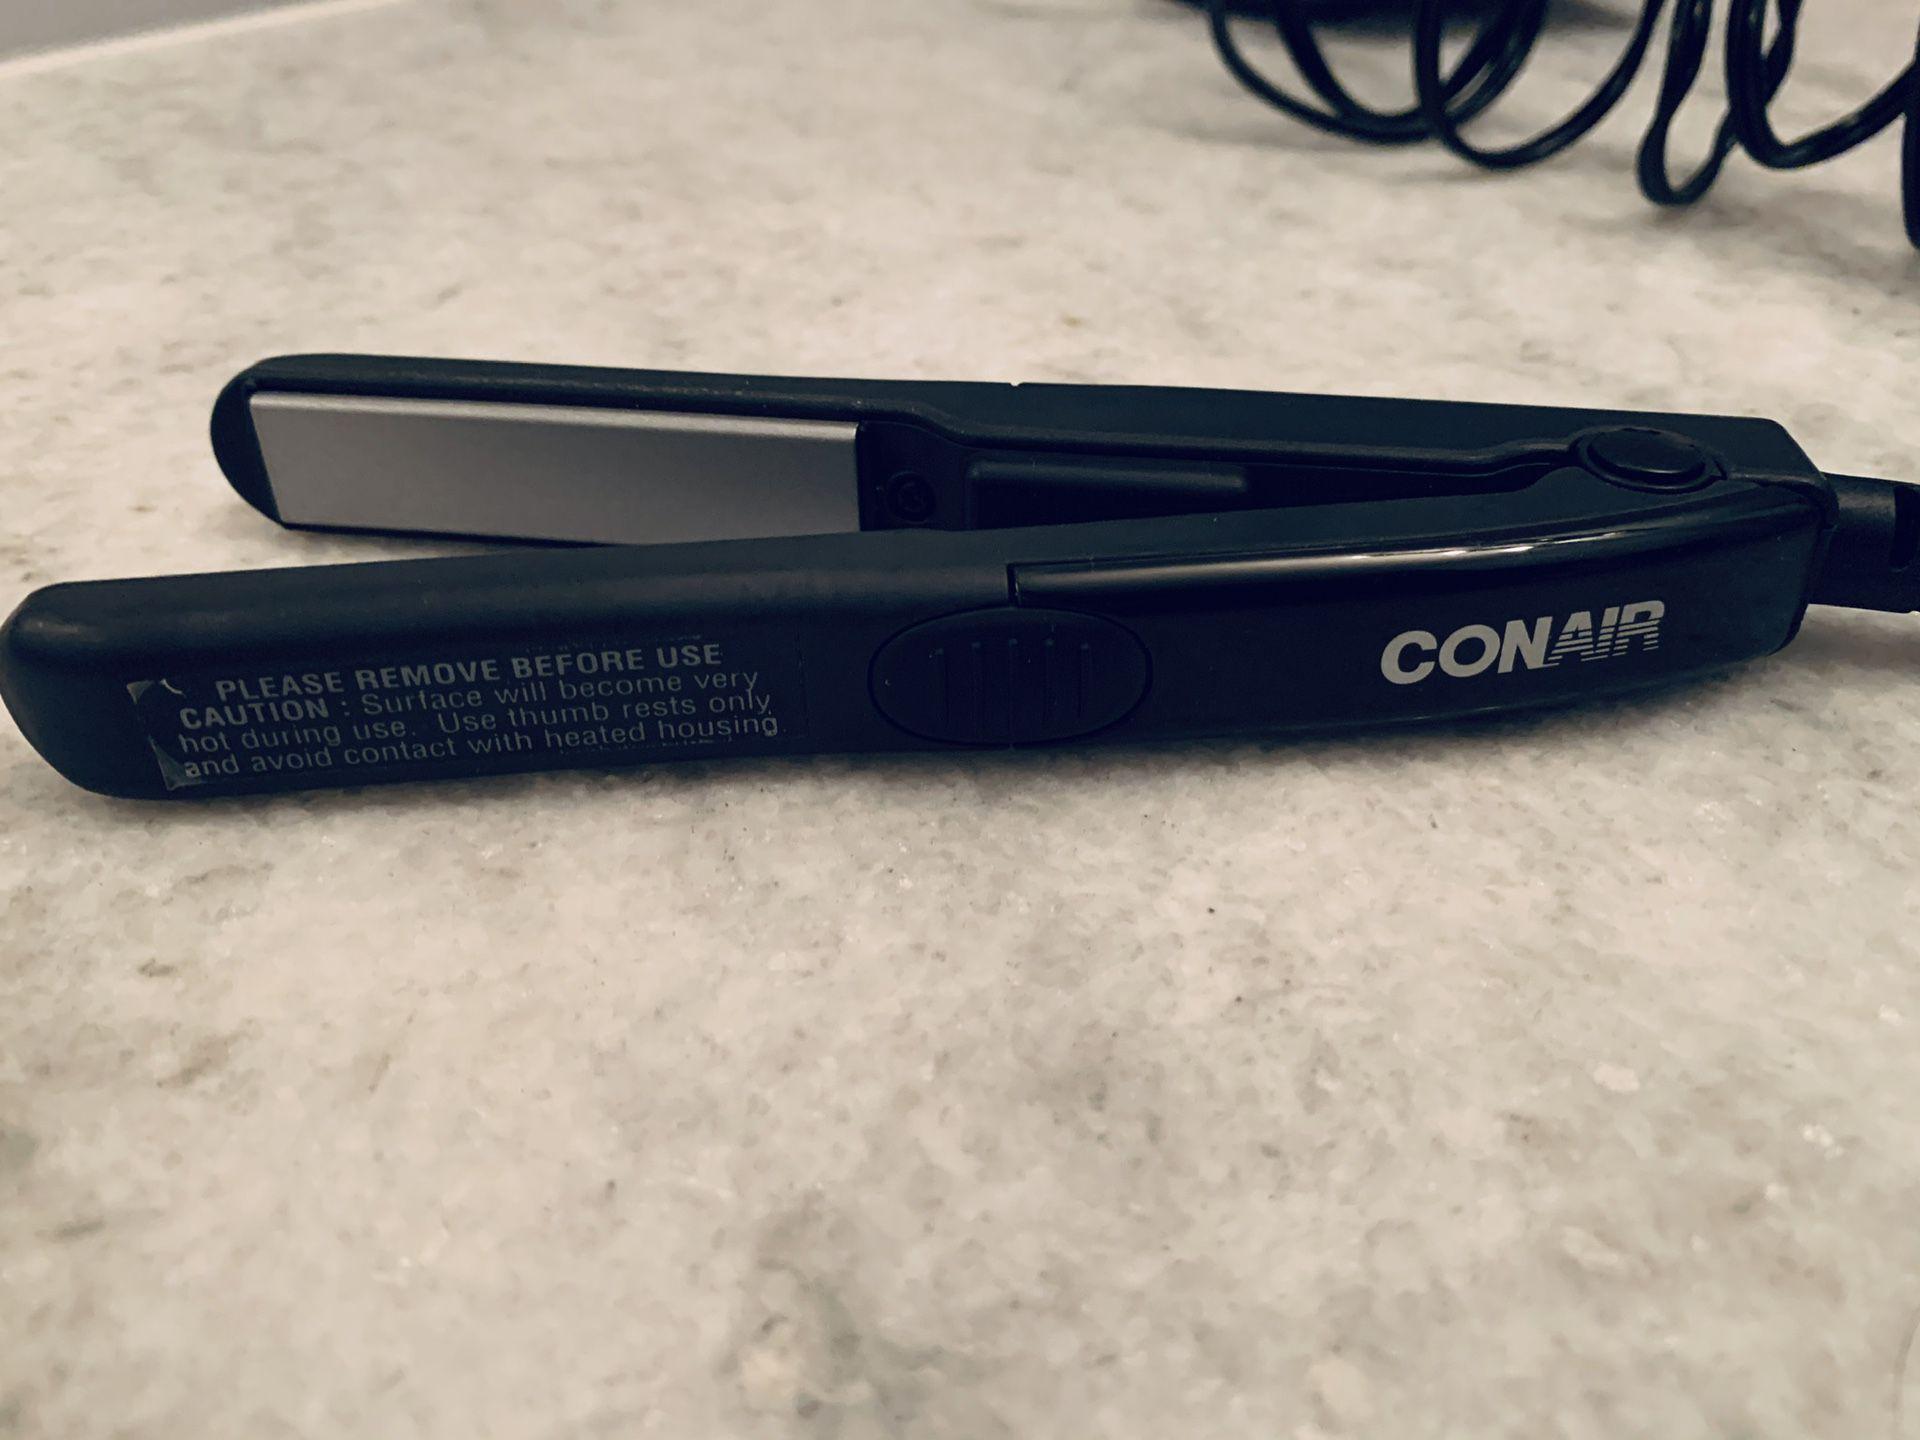 Conair MiniPro 1/2 Inch Ceramic Flat Iron